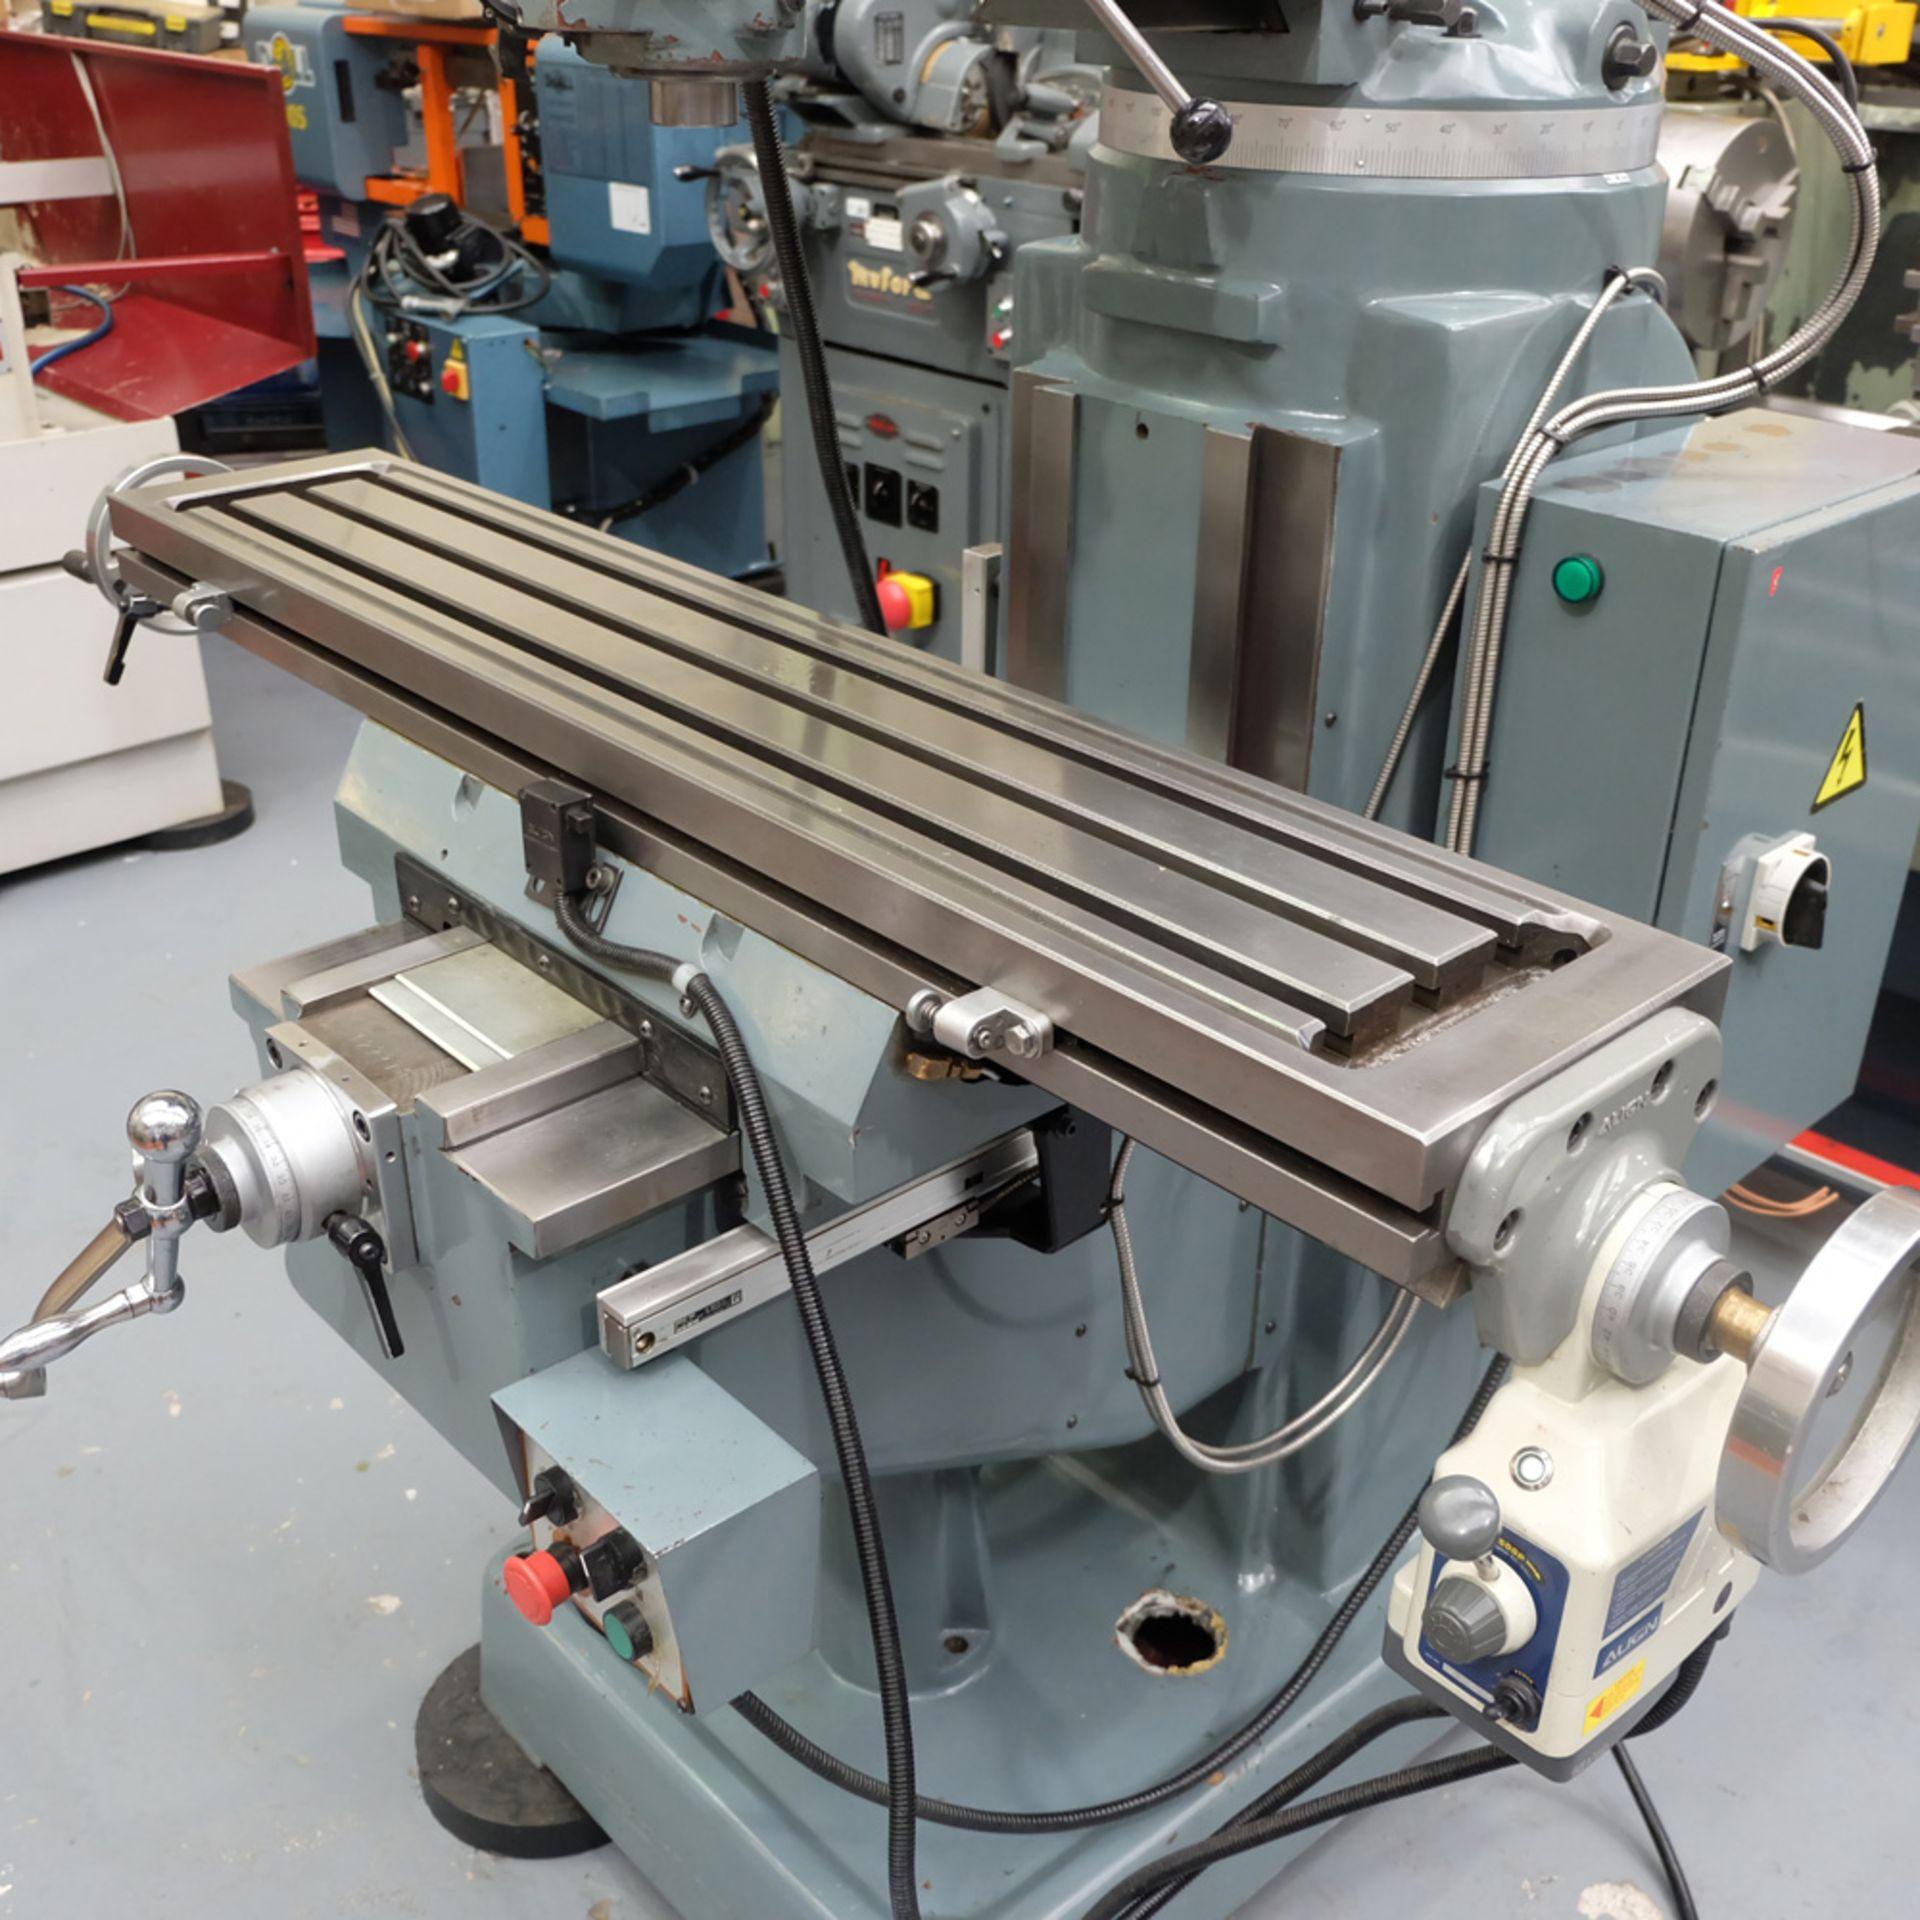 Braithwaite Model 6323B 3HP Vari Speed Turret Mill. - Image 6 of 18